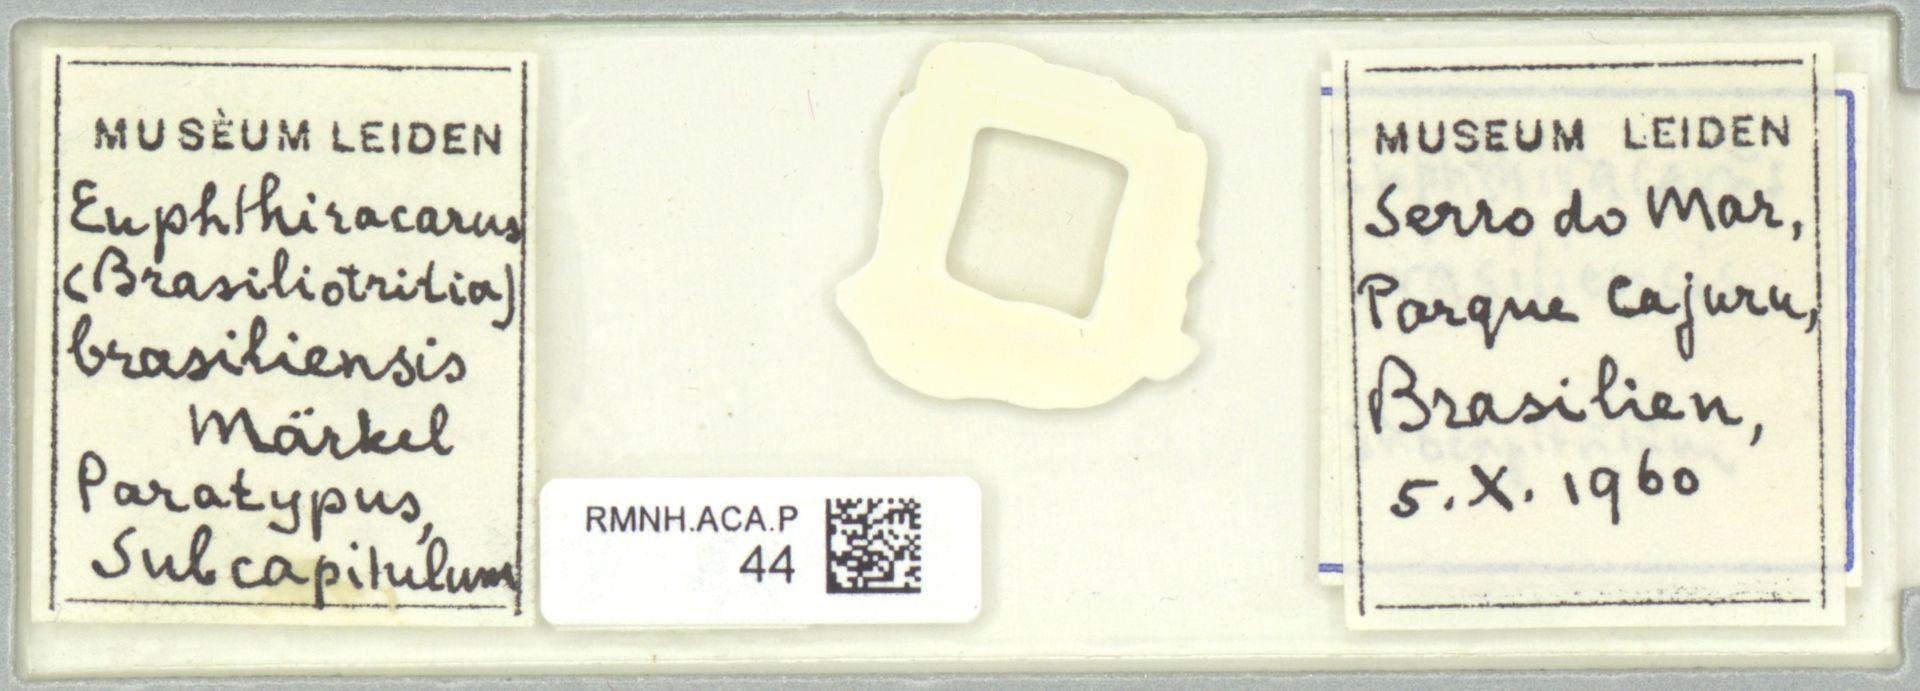 RMNH.ACA.P.44   Euphthiracarus brasiliensis Märkel